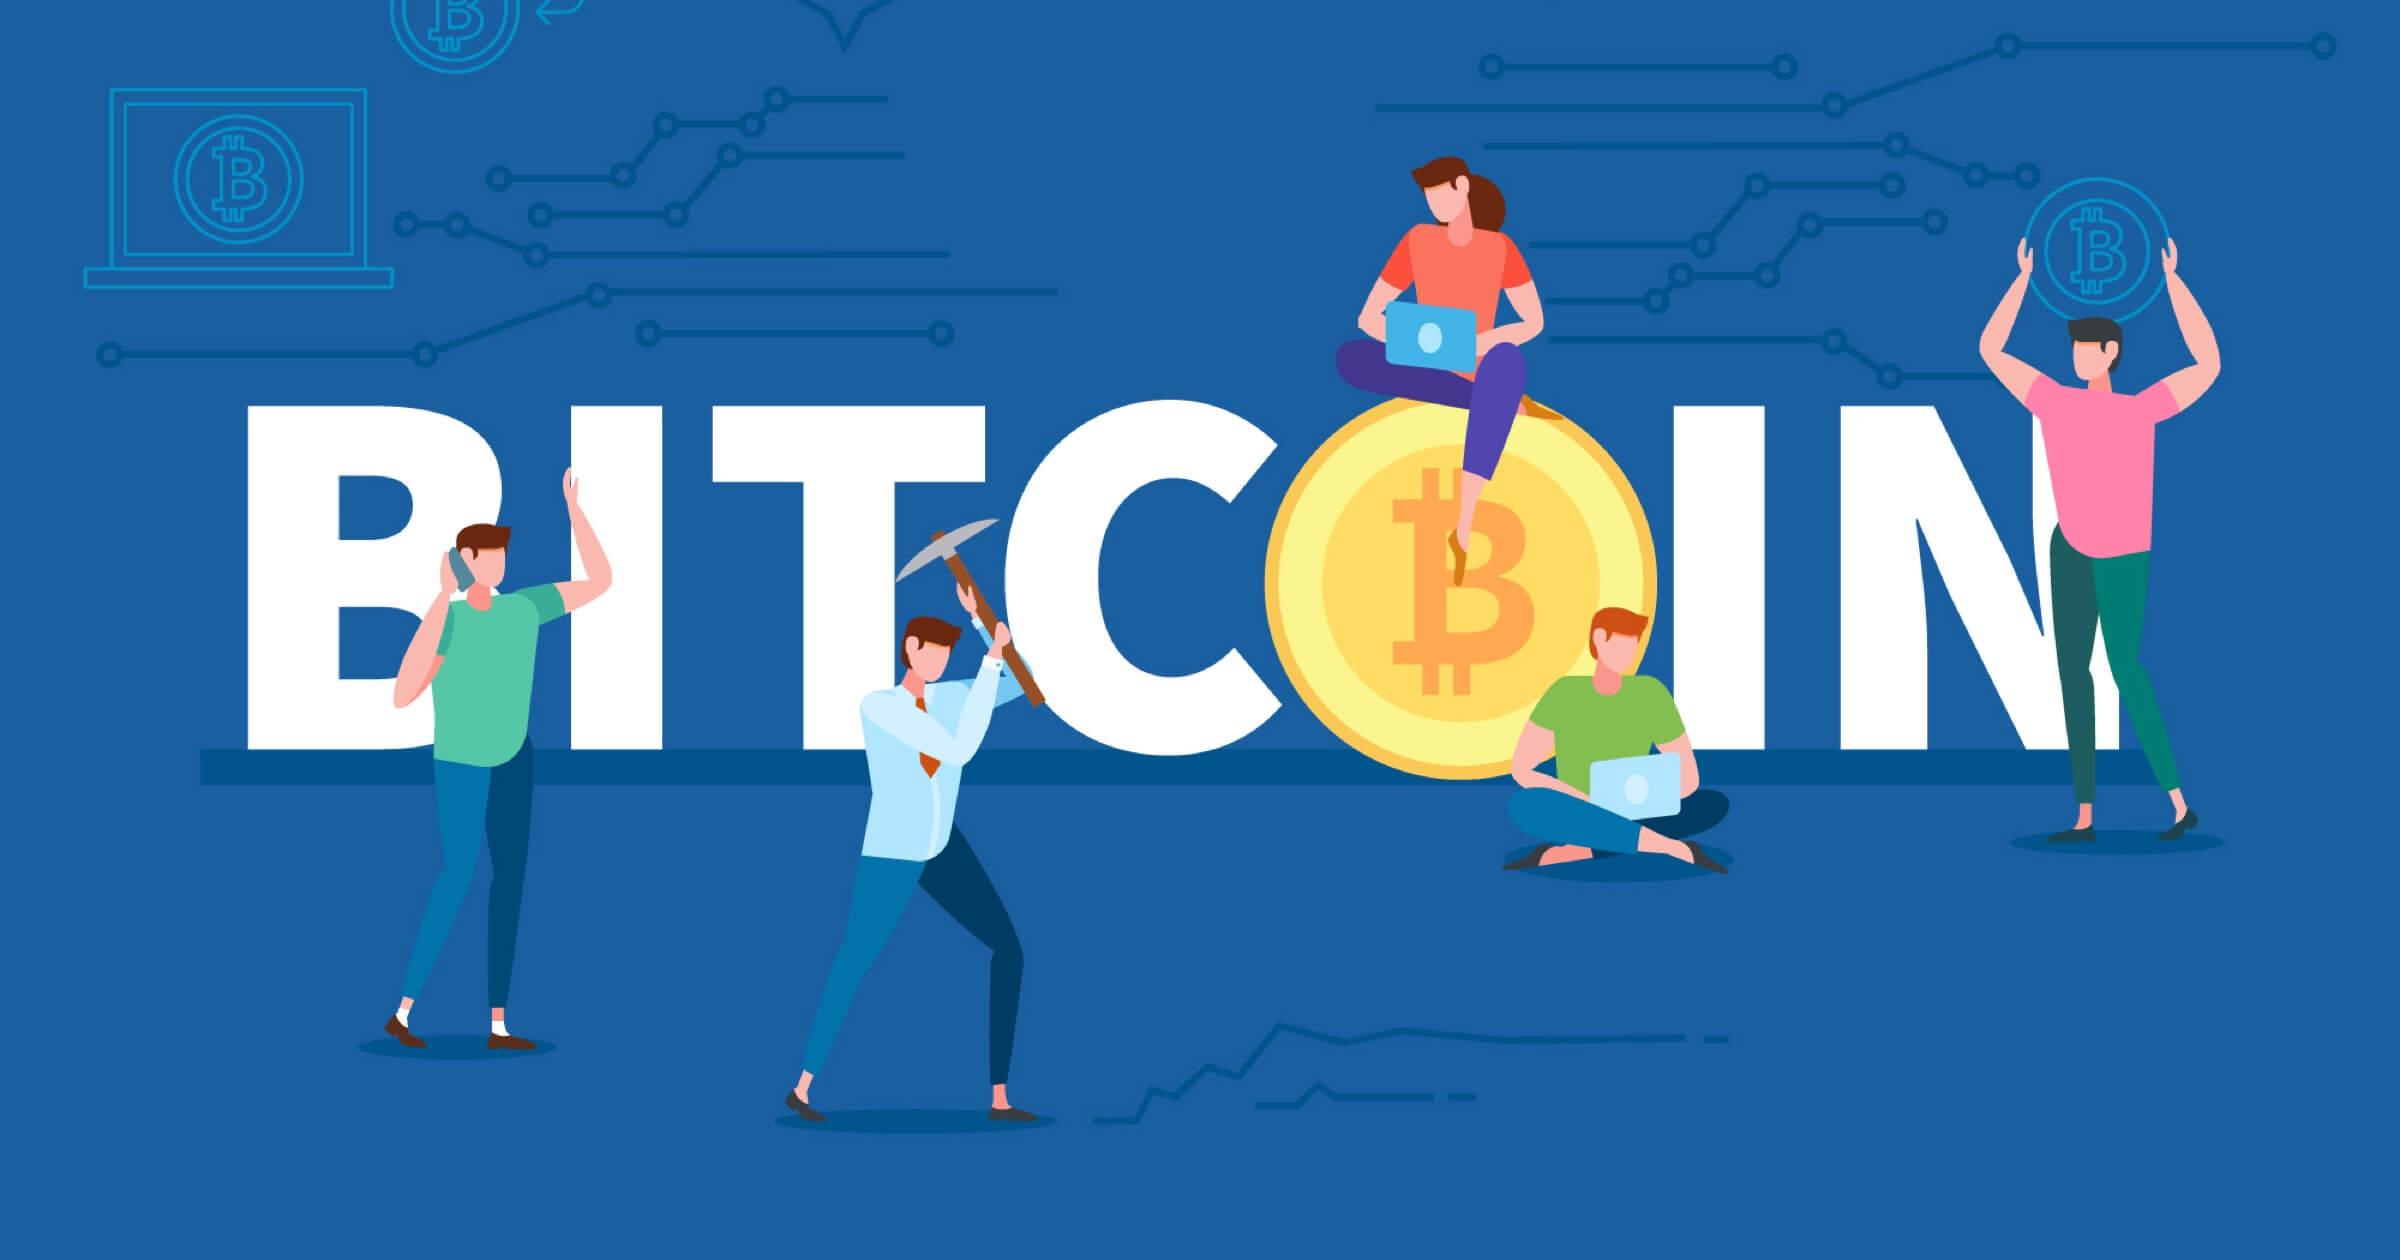 Preço do Bitcoin | Investtor